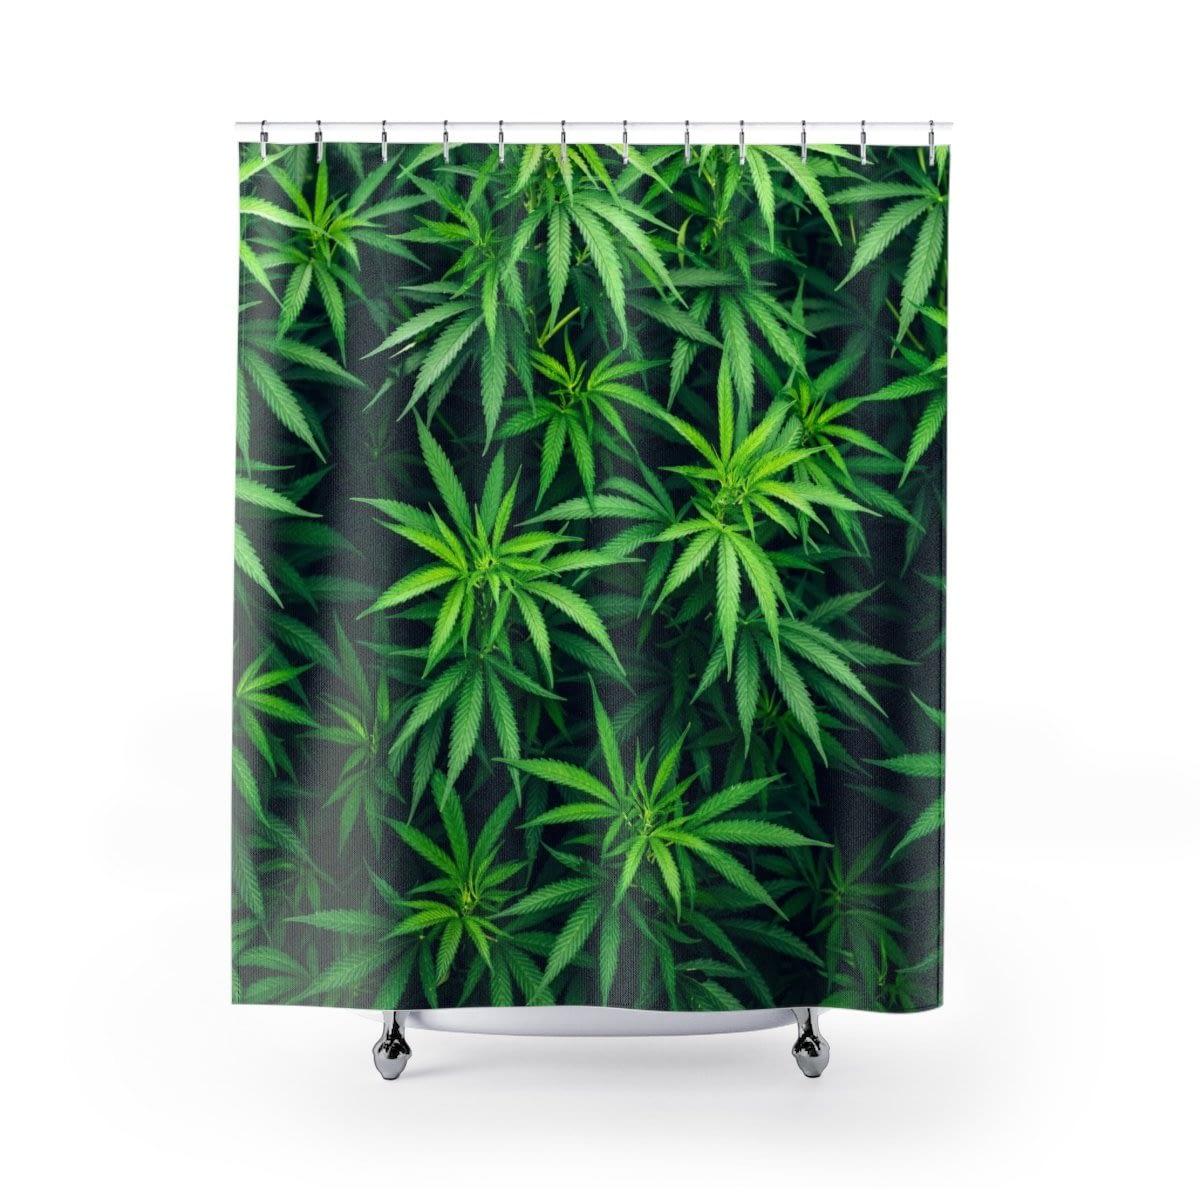 My Cannabis Shower Curtain